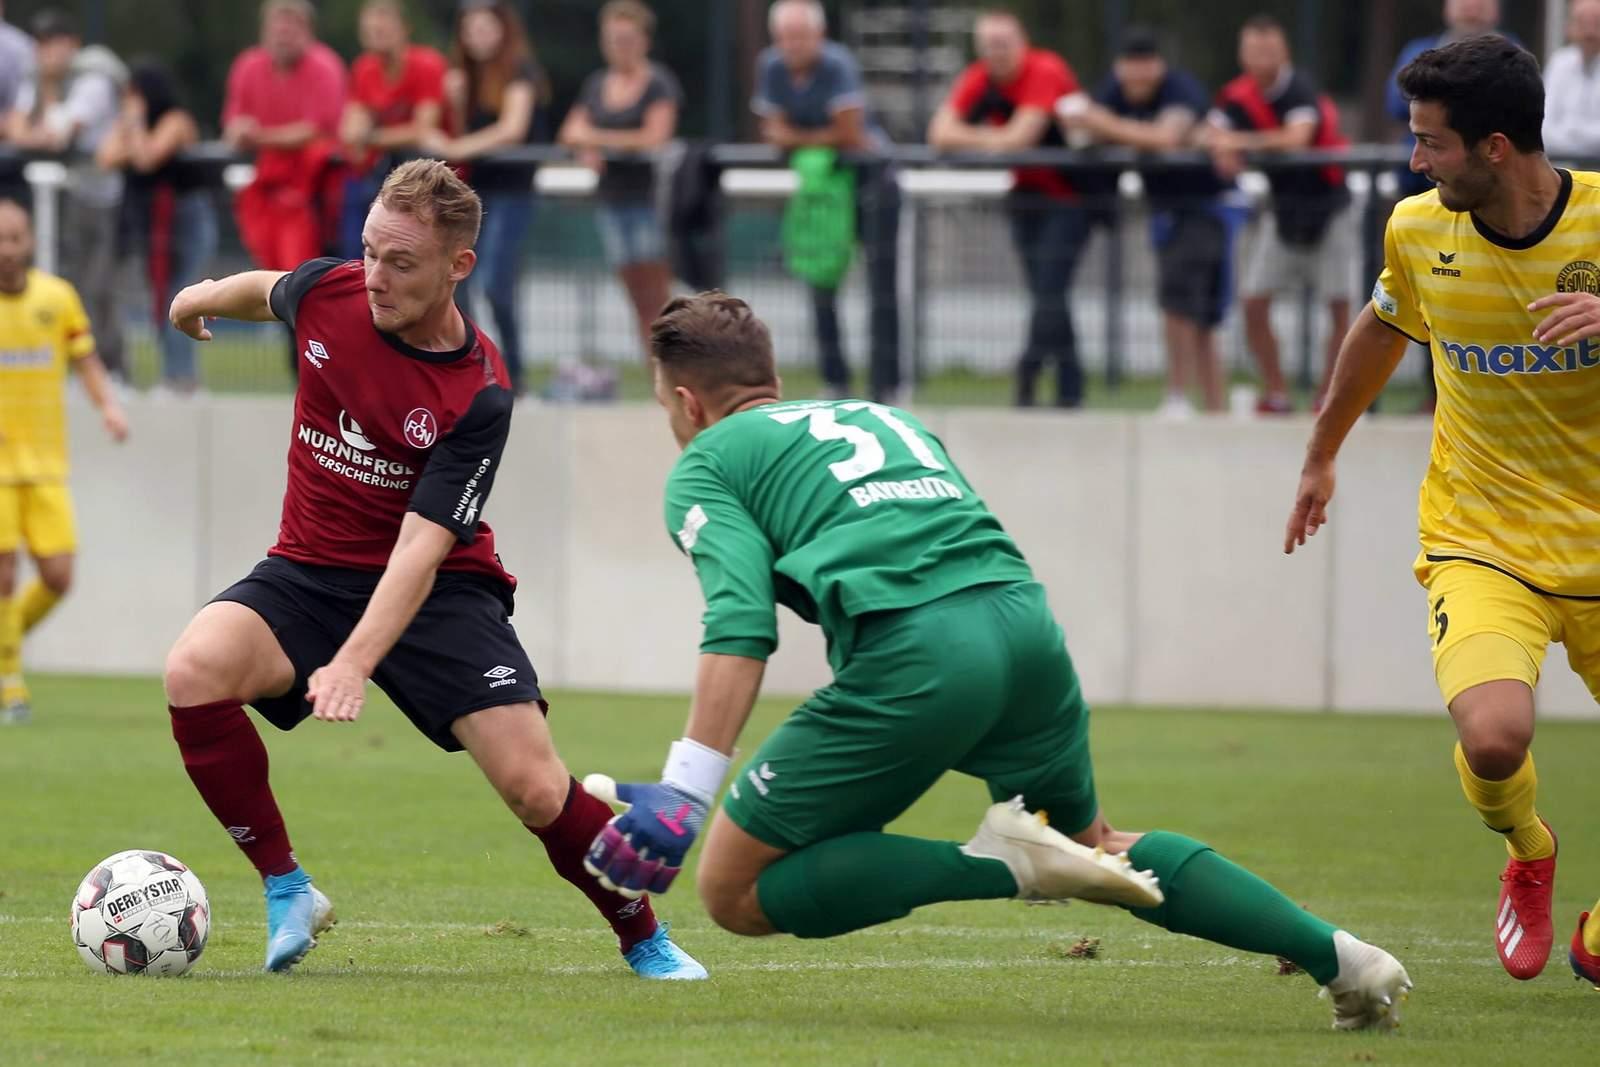 Federico Palacios beim Spiel Nürnberg U23 gegen Bayreuth